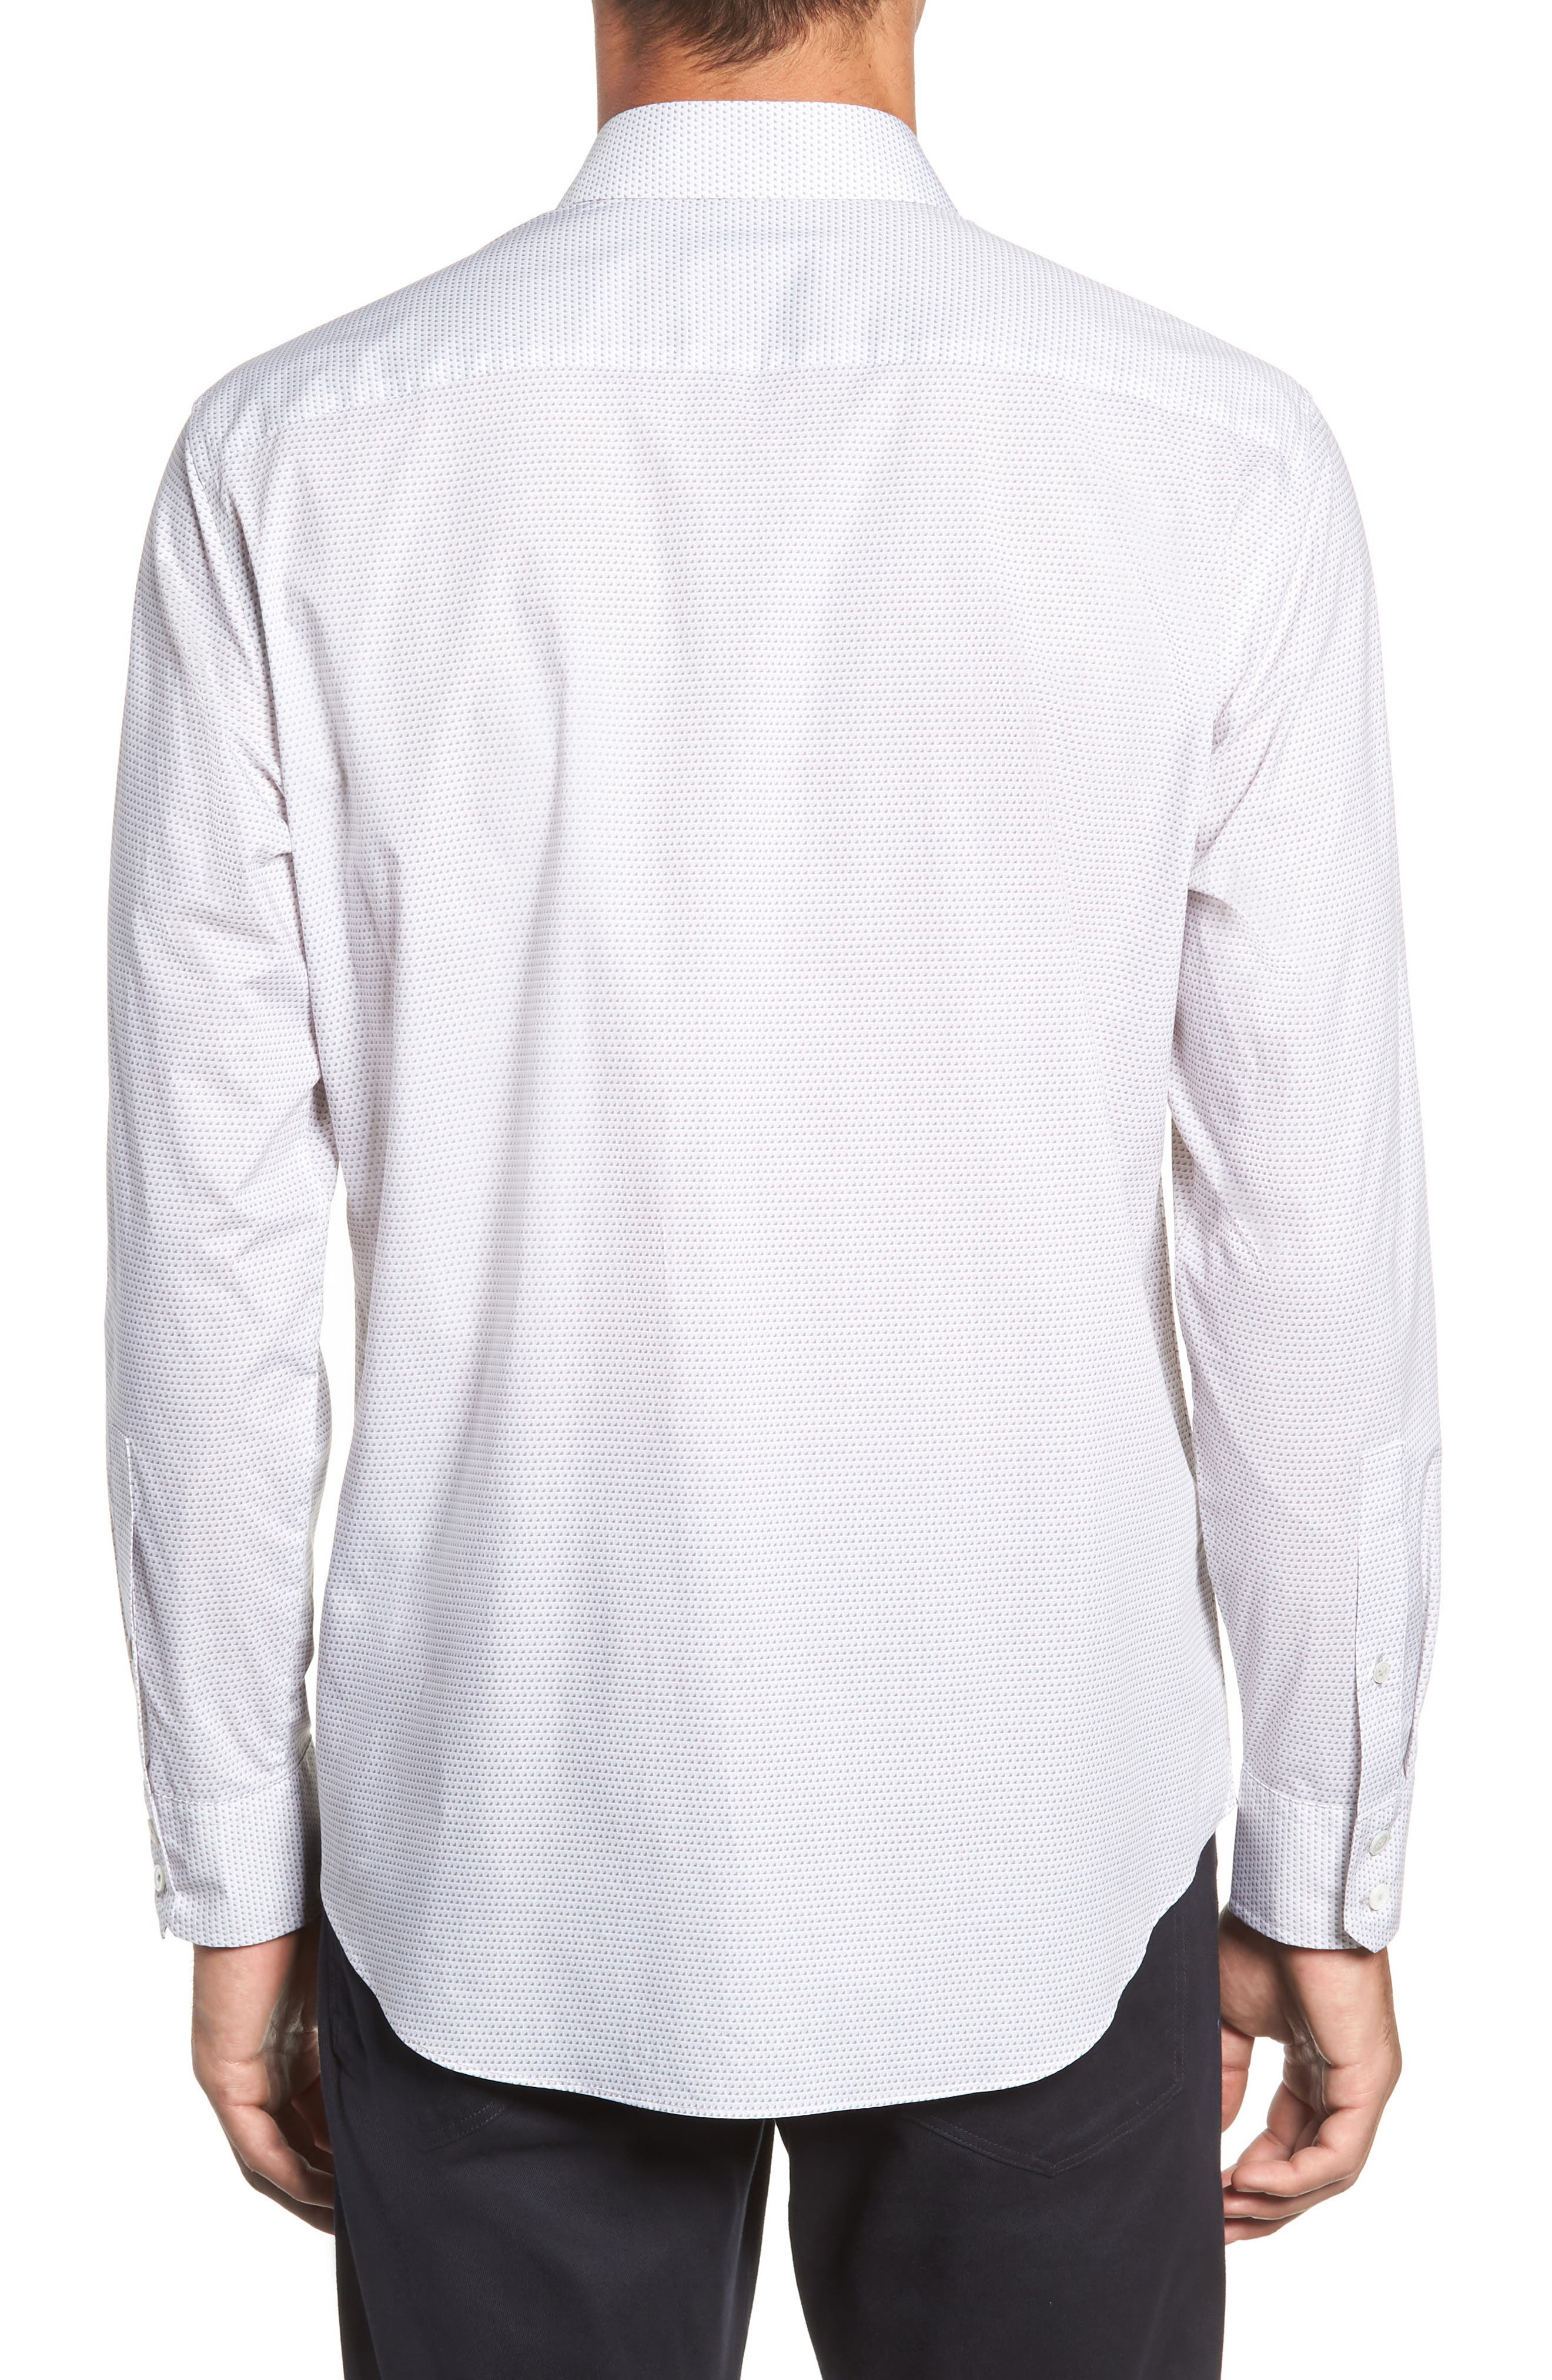 Toledo Regular Fit Microdot Sport Shirt,                             Alternate thumbnail 3, color,                             100